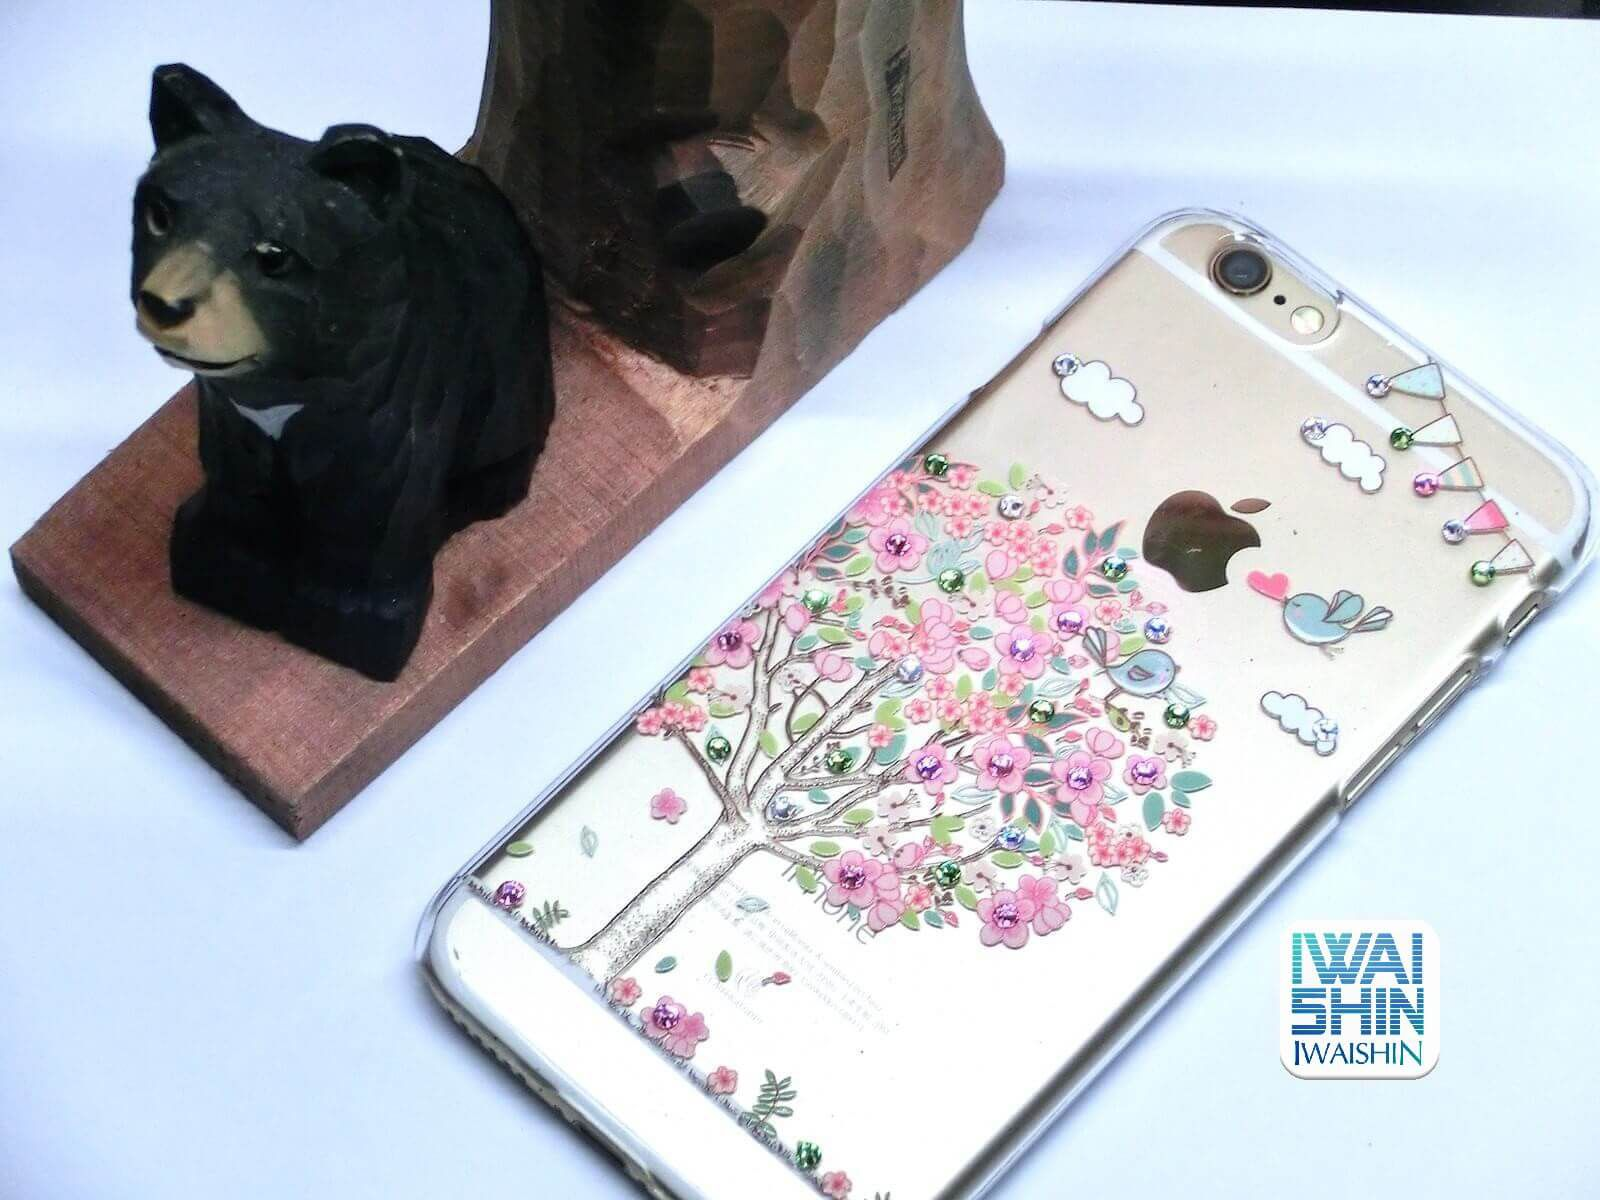 APBS 施華洛世奇 IPhone 6 保護殼5743